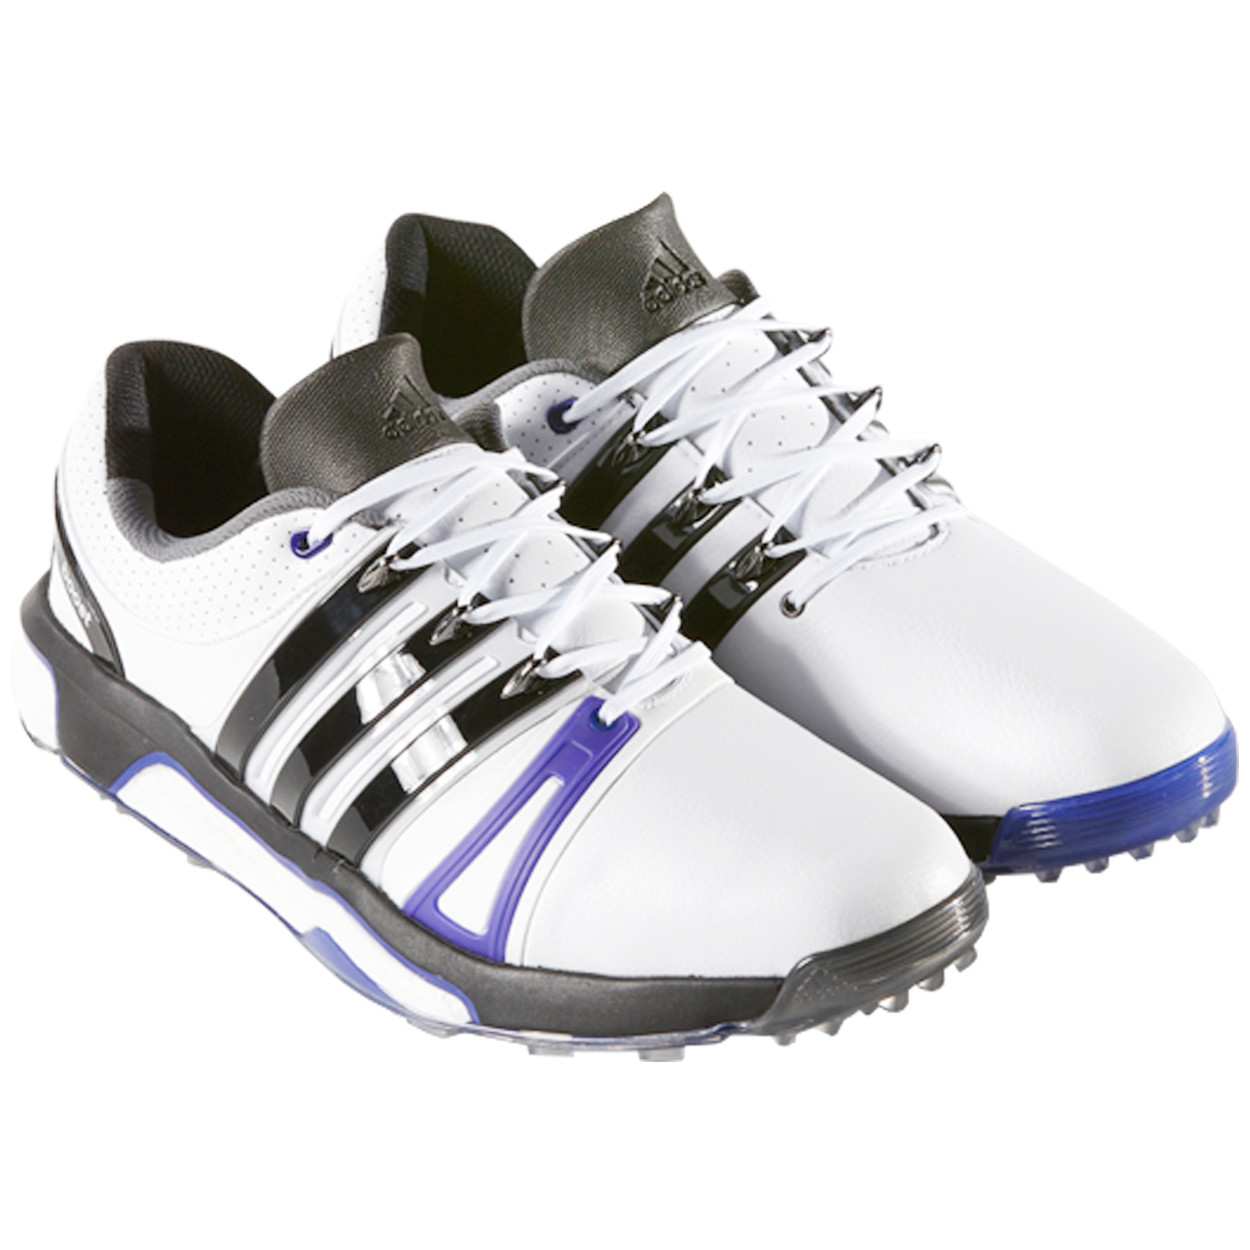 pretty nice d3a42 9d5d7 Adidas asym Energy Boost Golf Shoes